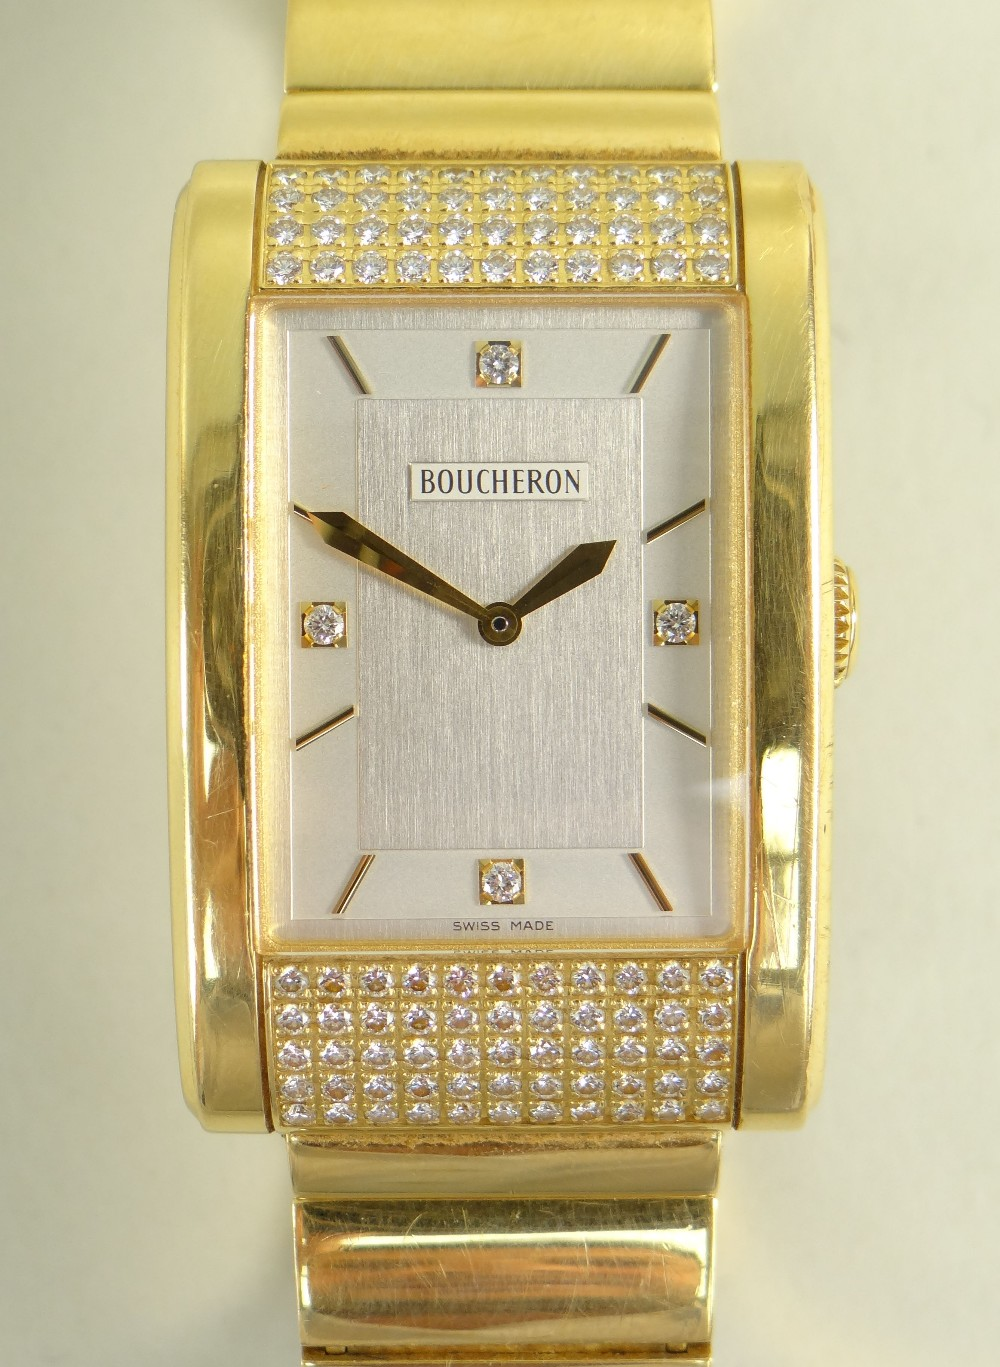 BOUCHERON 18K GOLD & DIAMOND GENTLEMAN'S 'REFLET' BRACELET WATCH, the signed, rectangular two-tone - Image 2 of 3